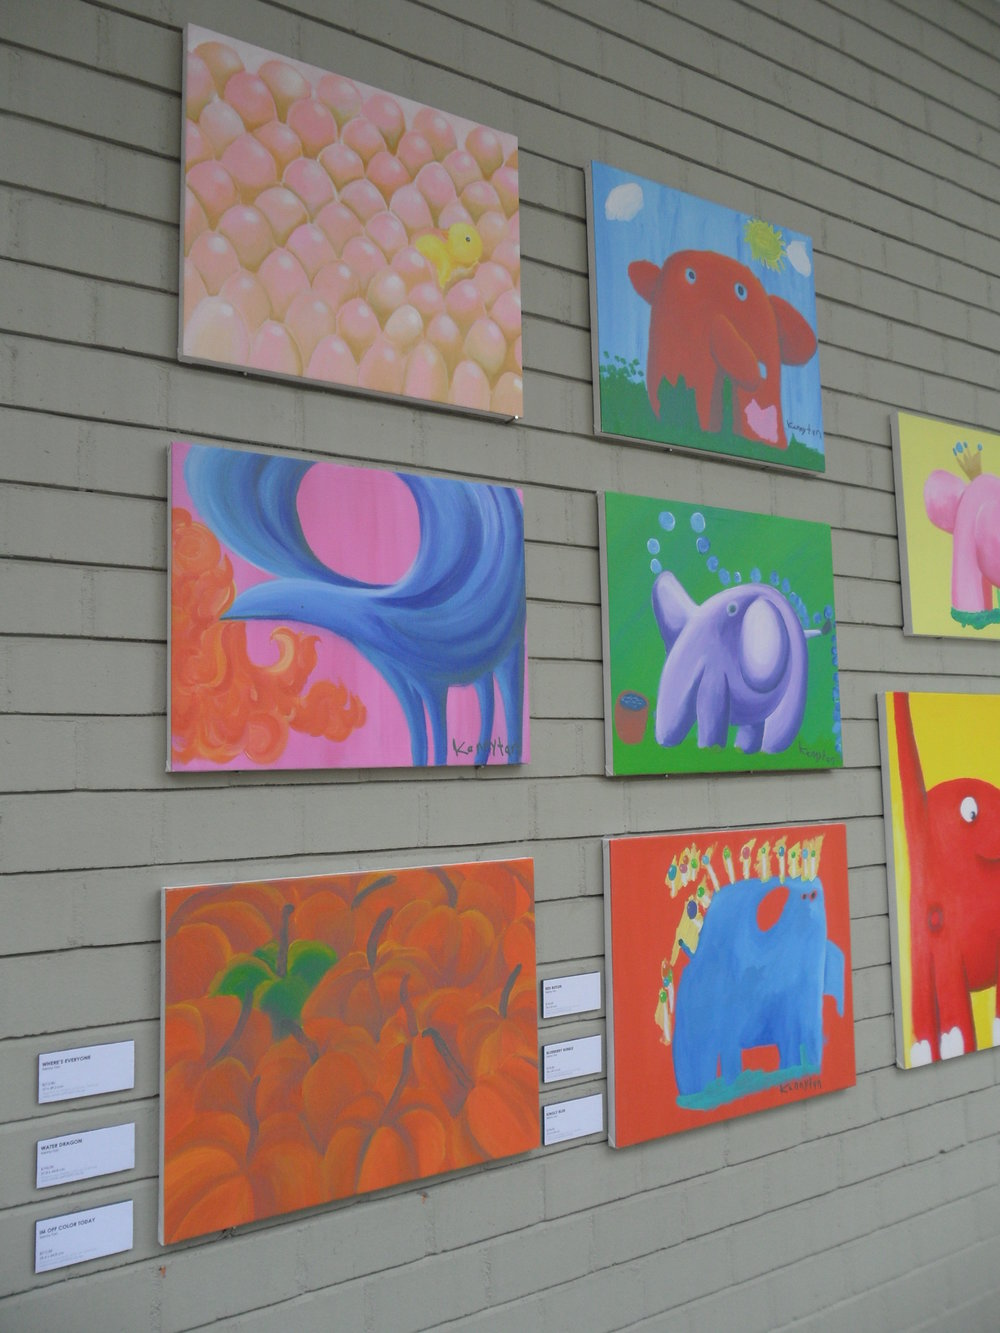 Where to View the Artwork - 1. Autism Resource Centre, 20 Lengkok Bahru #01-07, Singapore 159053.2. Pathlight Mall, 5 Ang Mo Kio Ave 10, Singapore 569739.3. Smoke by Shou Sugi Ban Gallery, 7 Opal Crescent, Singapore 328402.